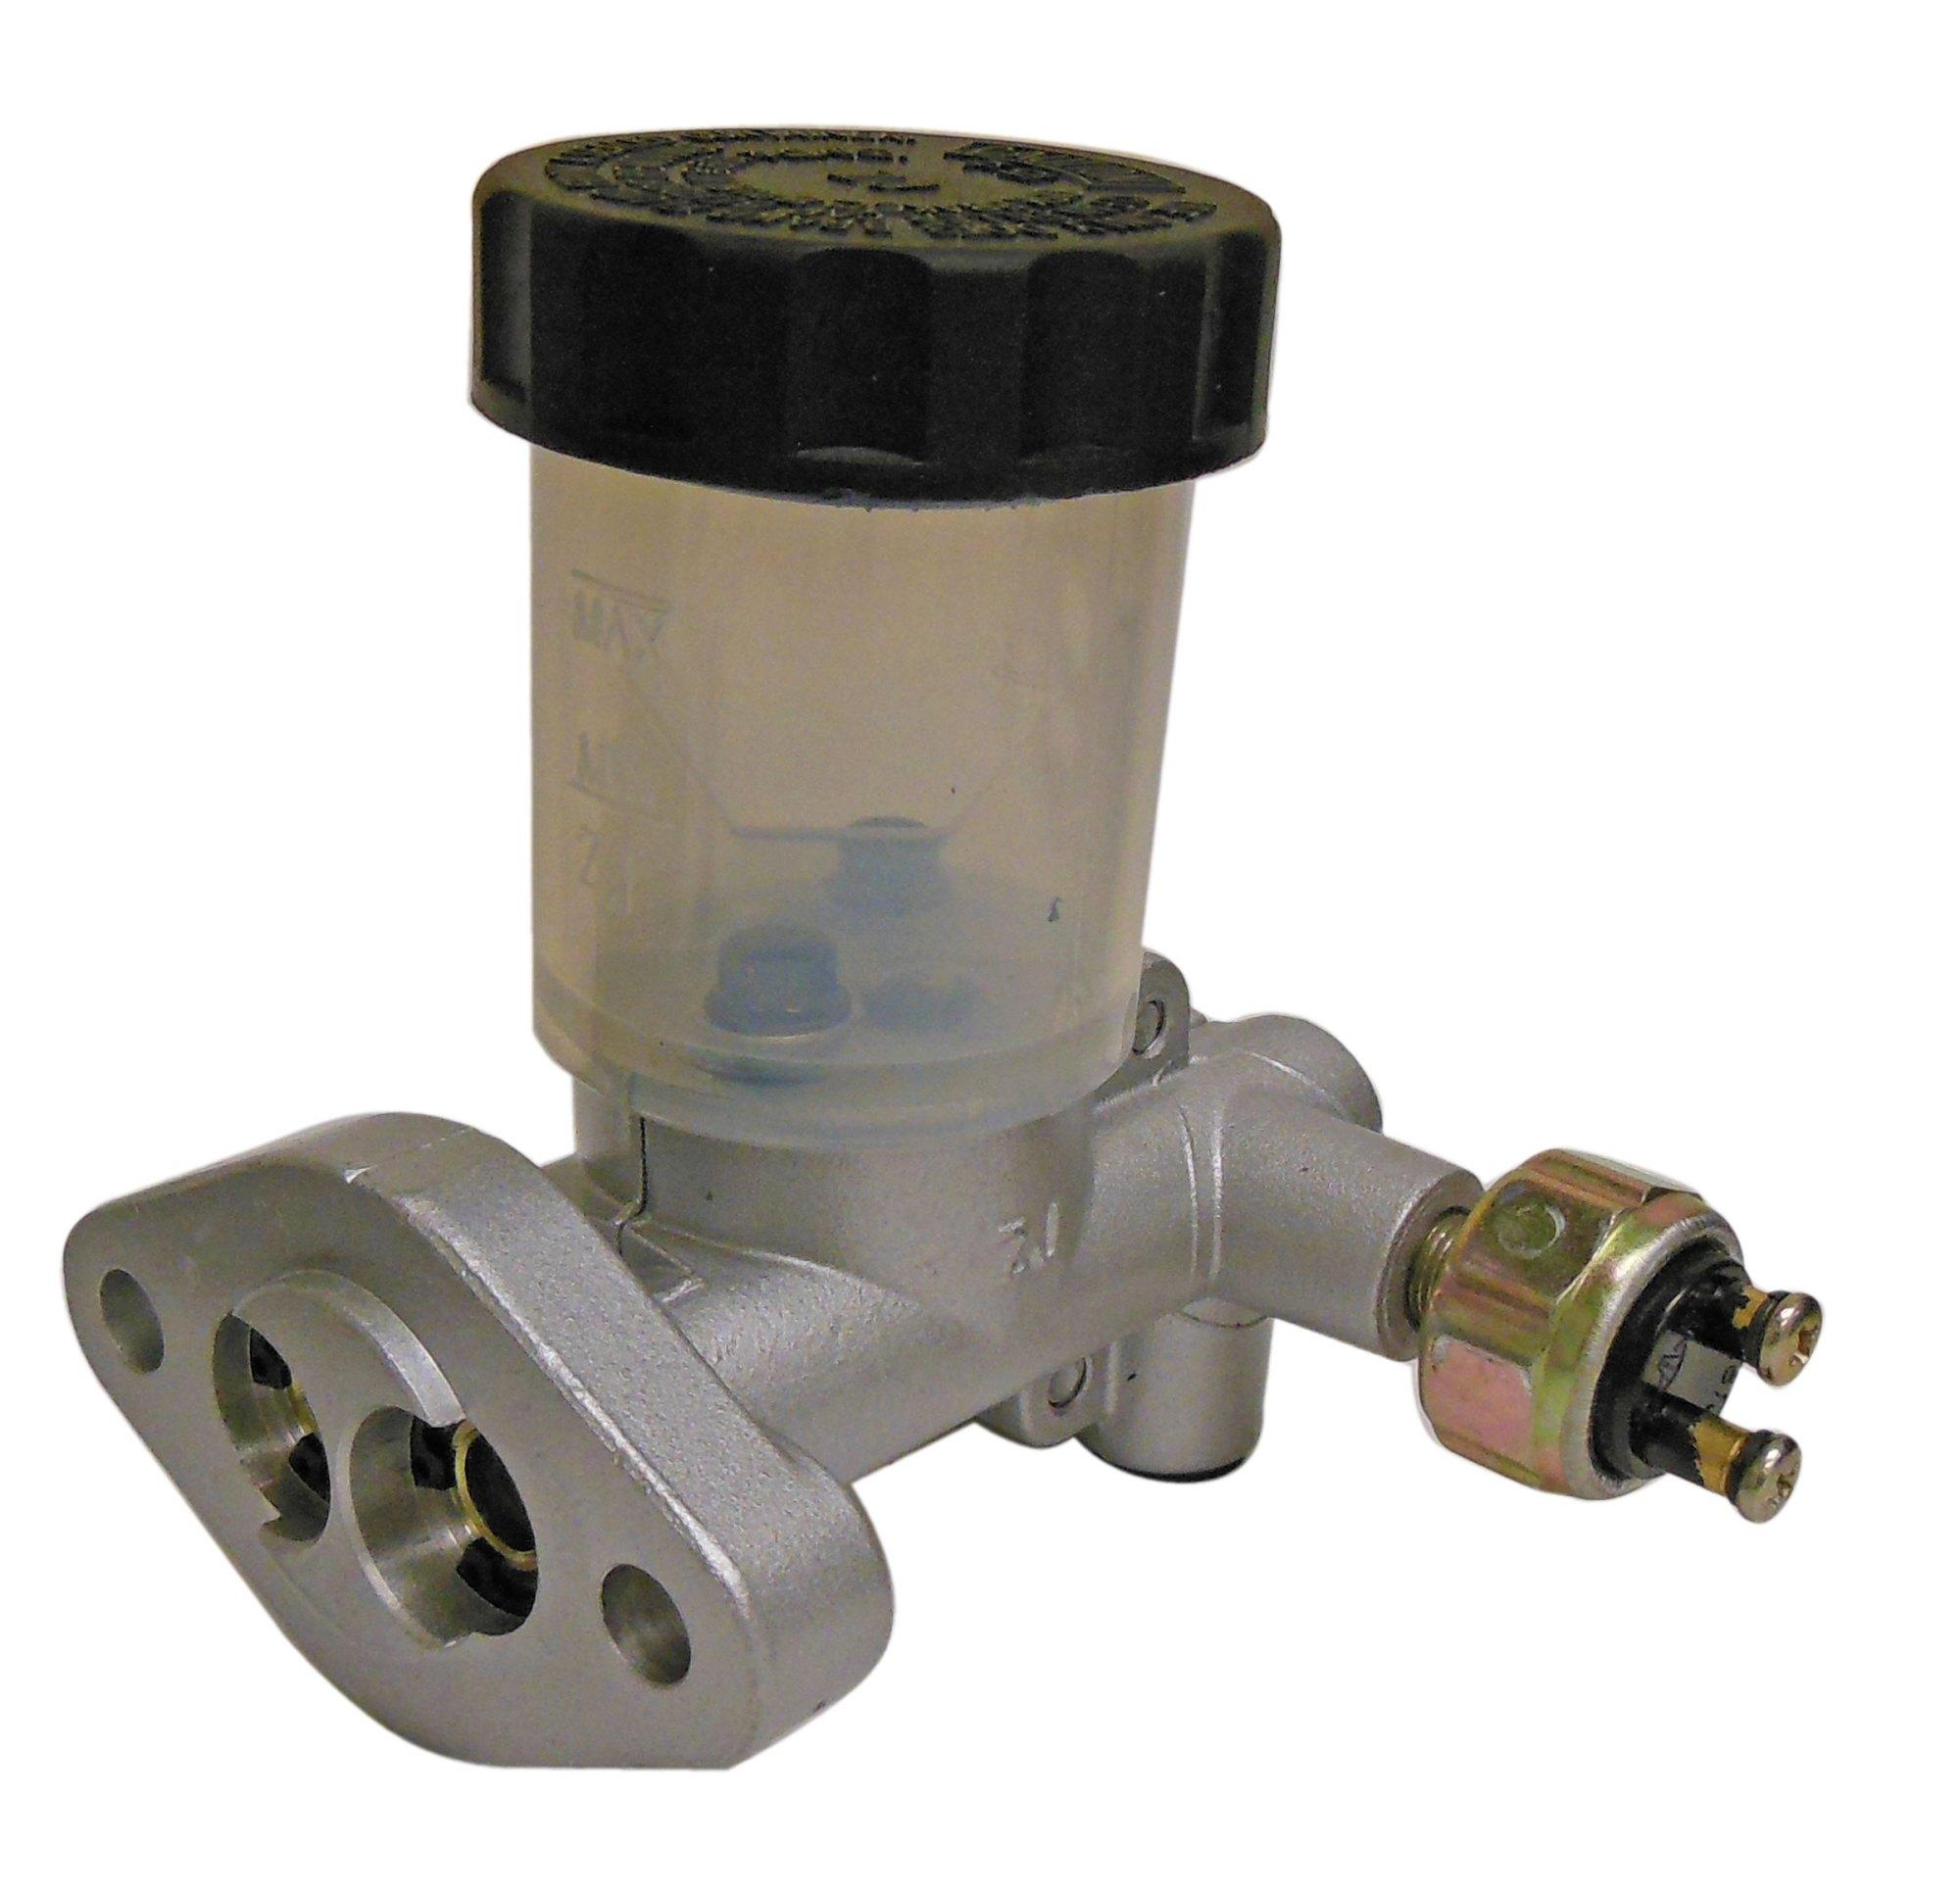 hight resolution of similiar hammerhead go kart parts keywords master cylinder for 150cc 250cc hammerhead 6 000 076 501115 technical info technical info 7150 wiring diagram